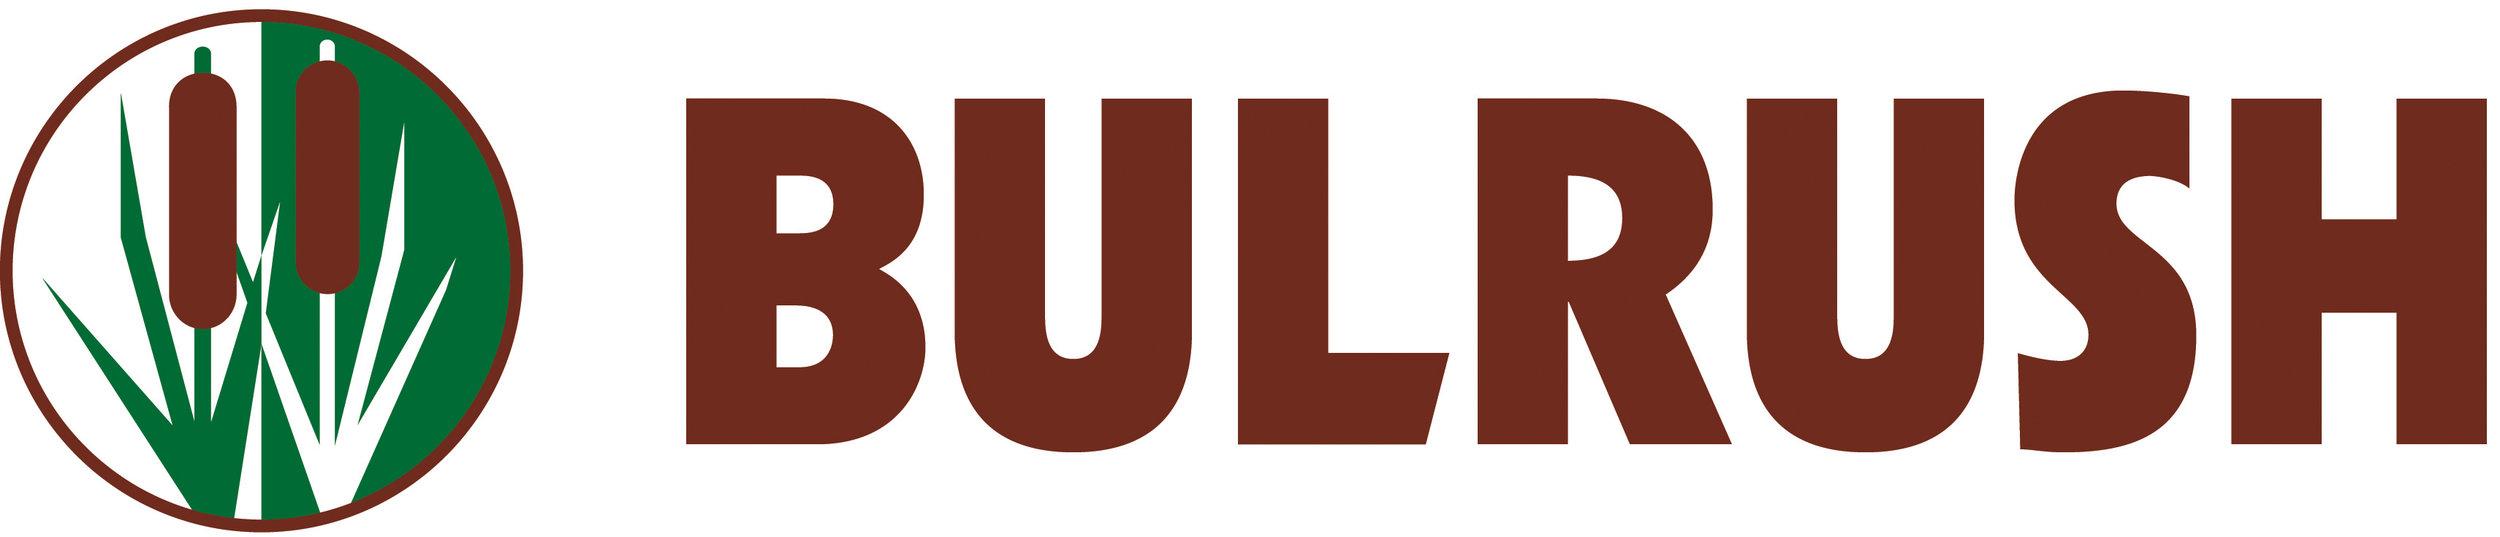 Bulrush - Logo.jpg